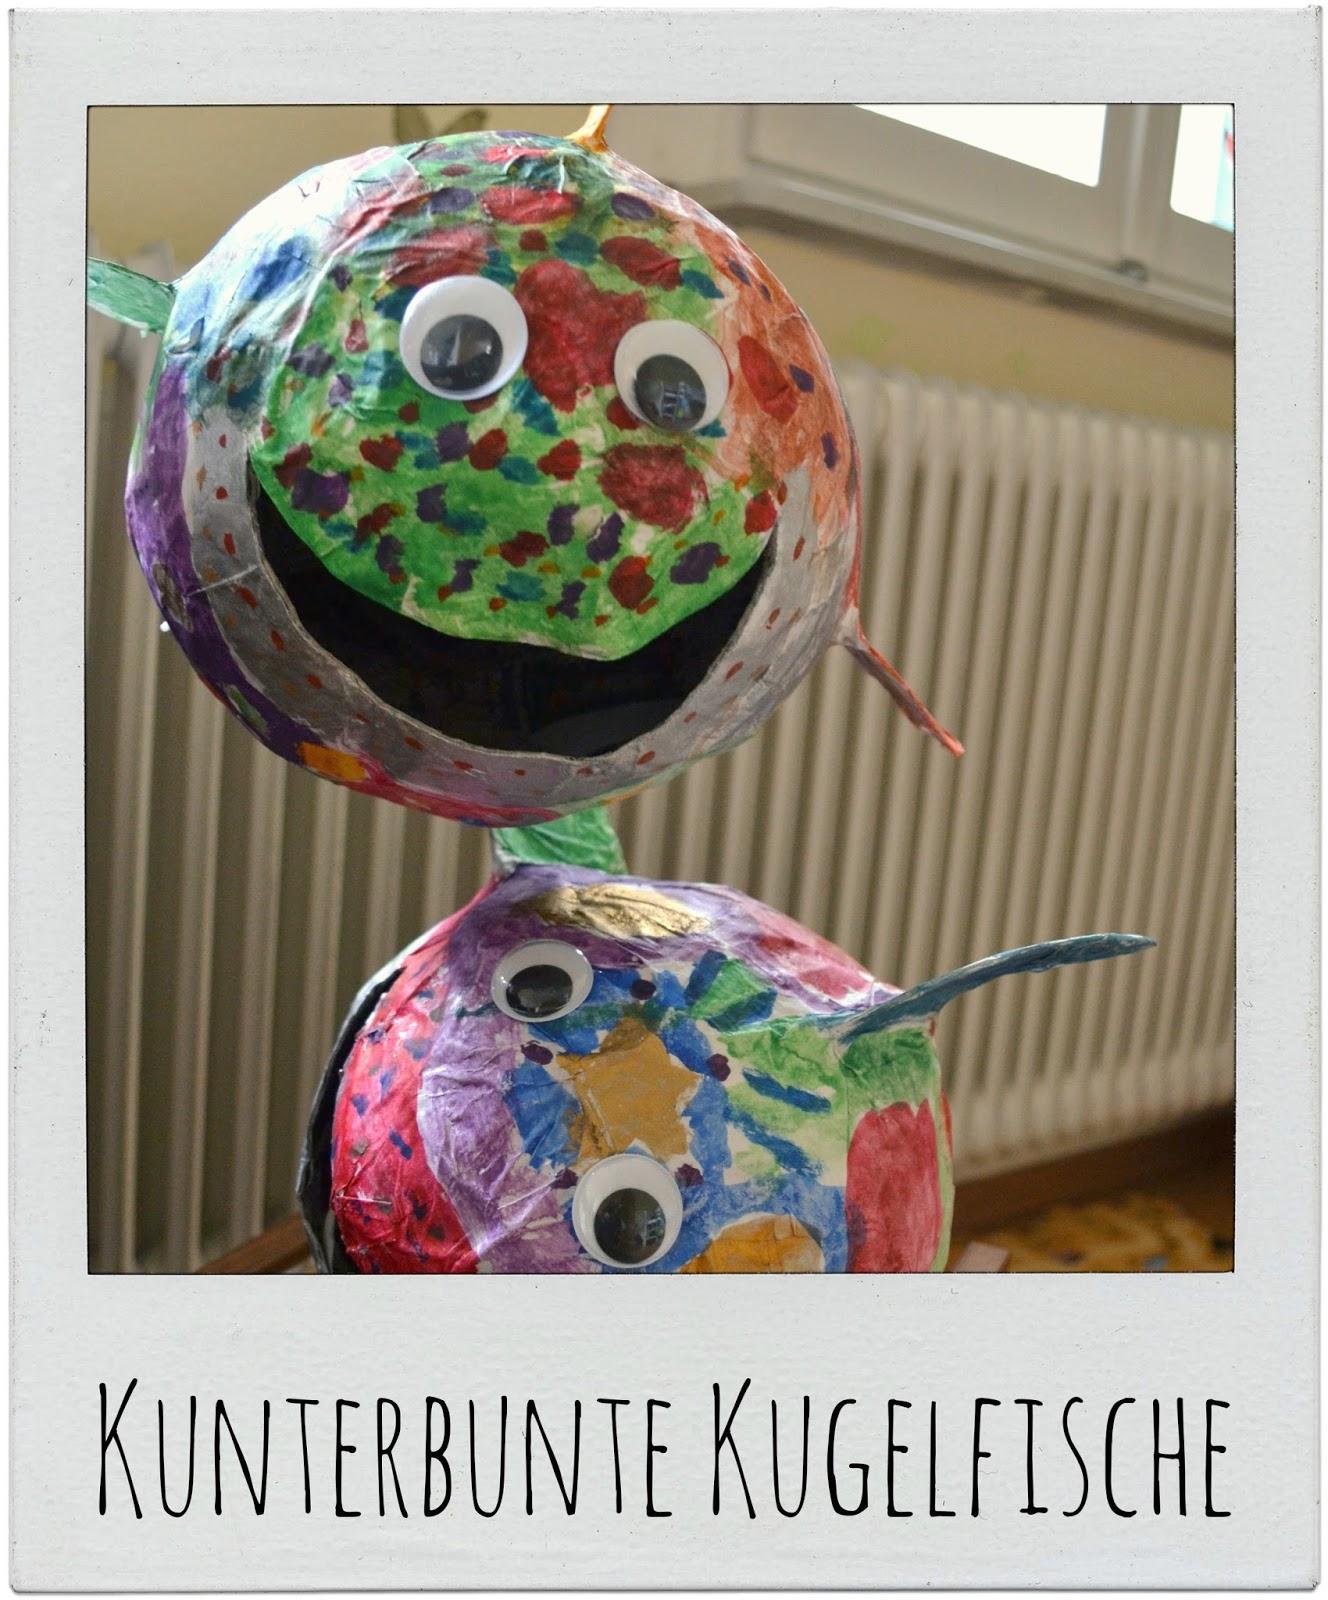 http://gemachtesundgedachtes.blogspot.de/2014/02/kunterbunte-kugelfische.html